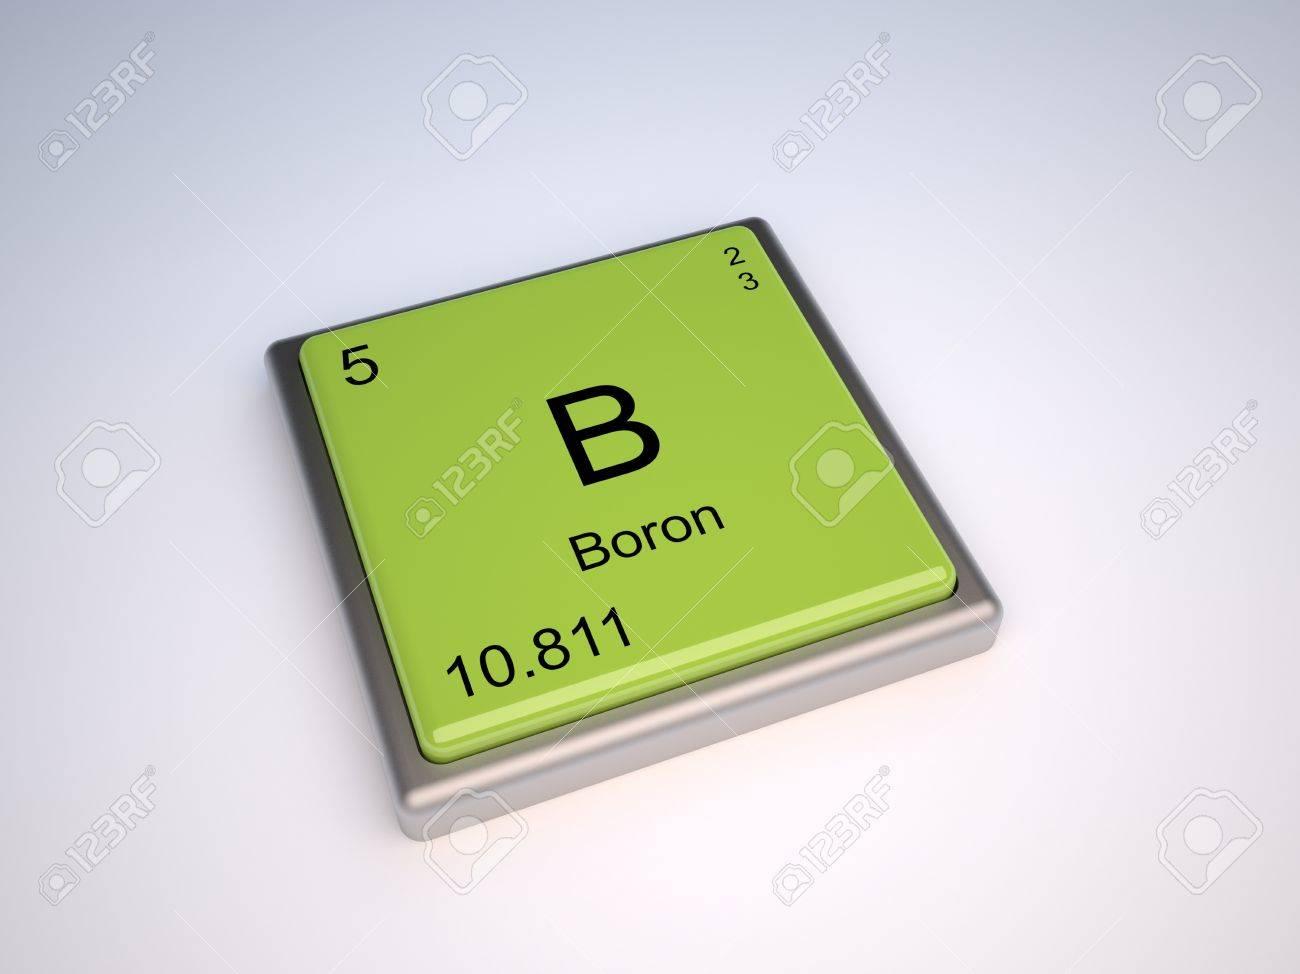 Elemento qumico de boro de la tabla peridica con smbolo b elemento qumico de boro de la tabla peridica con smbolo b iupac foto de archivo urtaz Images